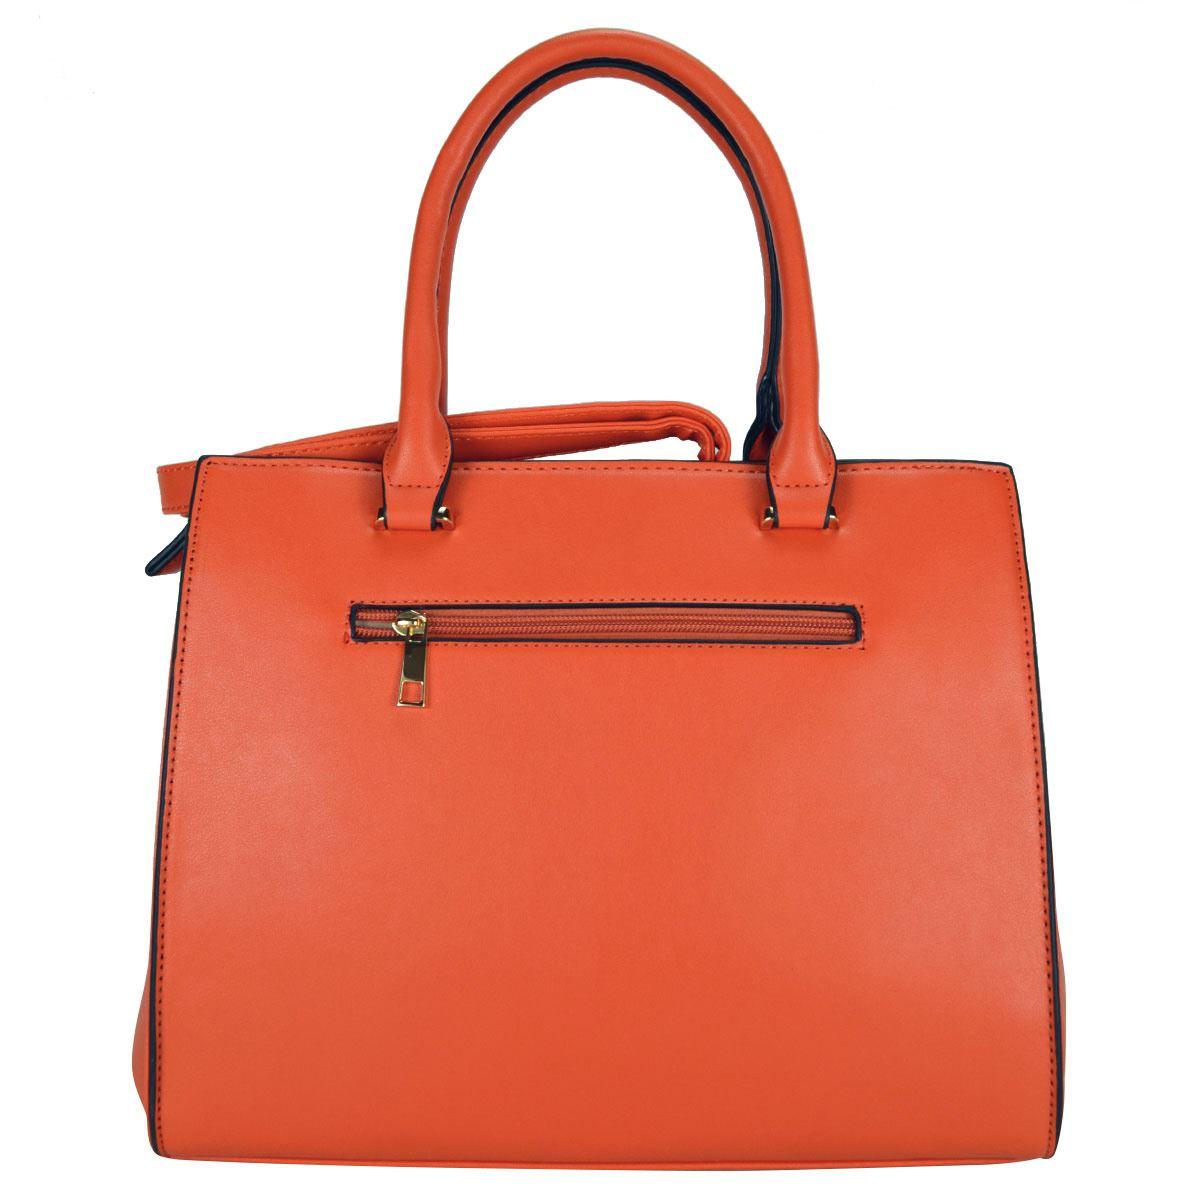 Bolsa satchel HUSER sintético 248-1 naranja